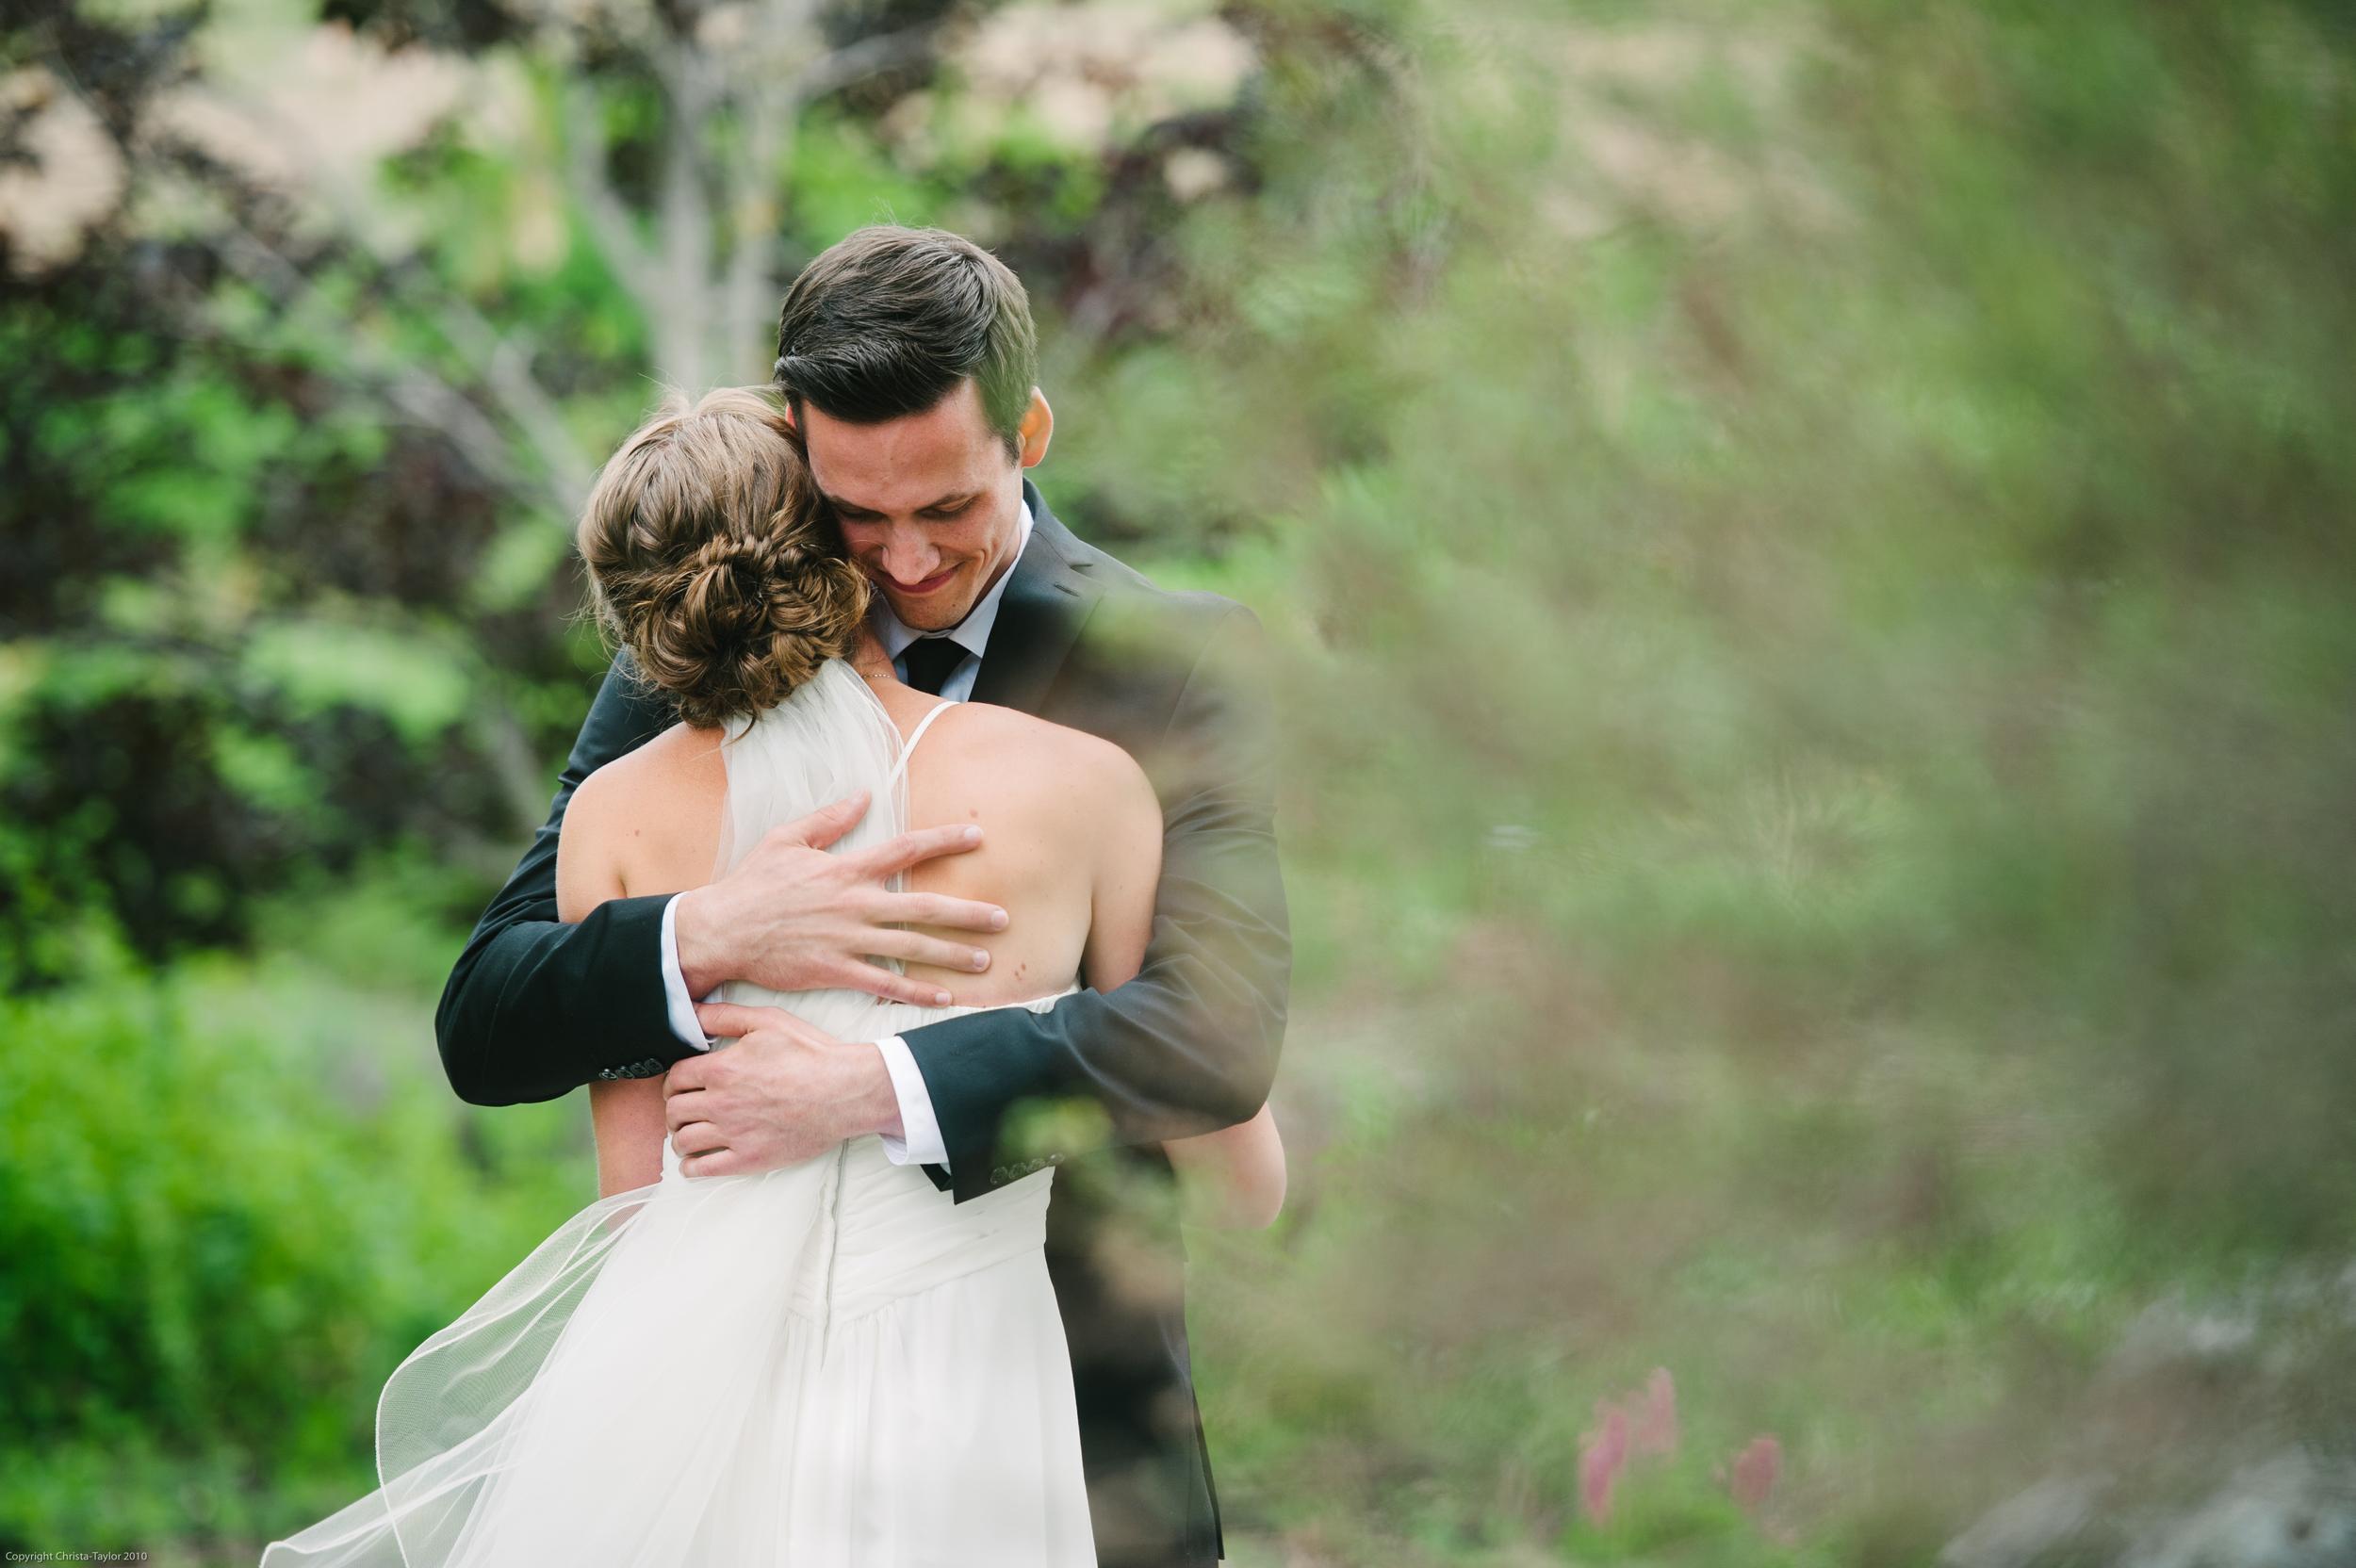 15-moscow_idaho_wedding_sam_and_gracie-55.jpg